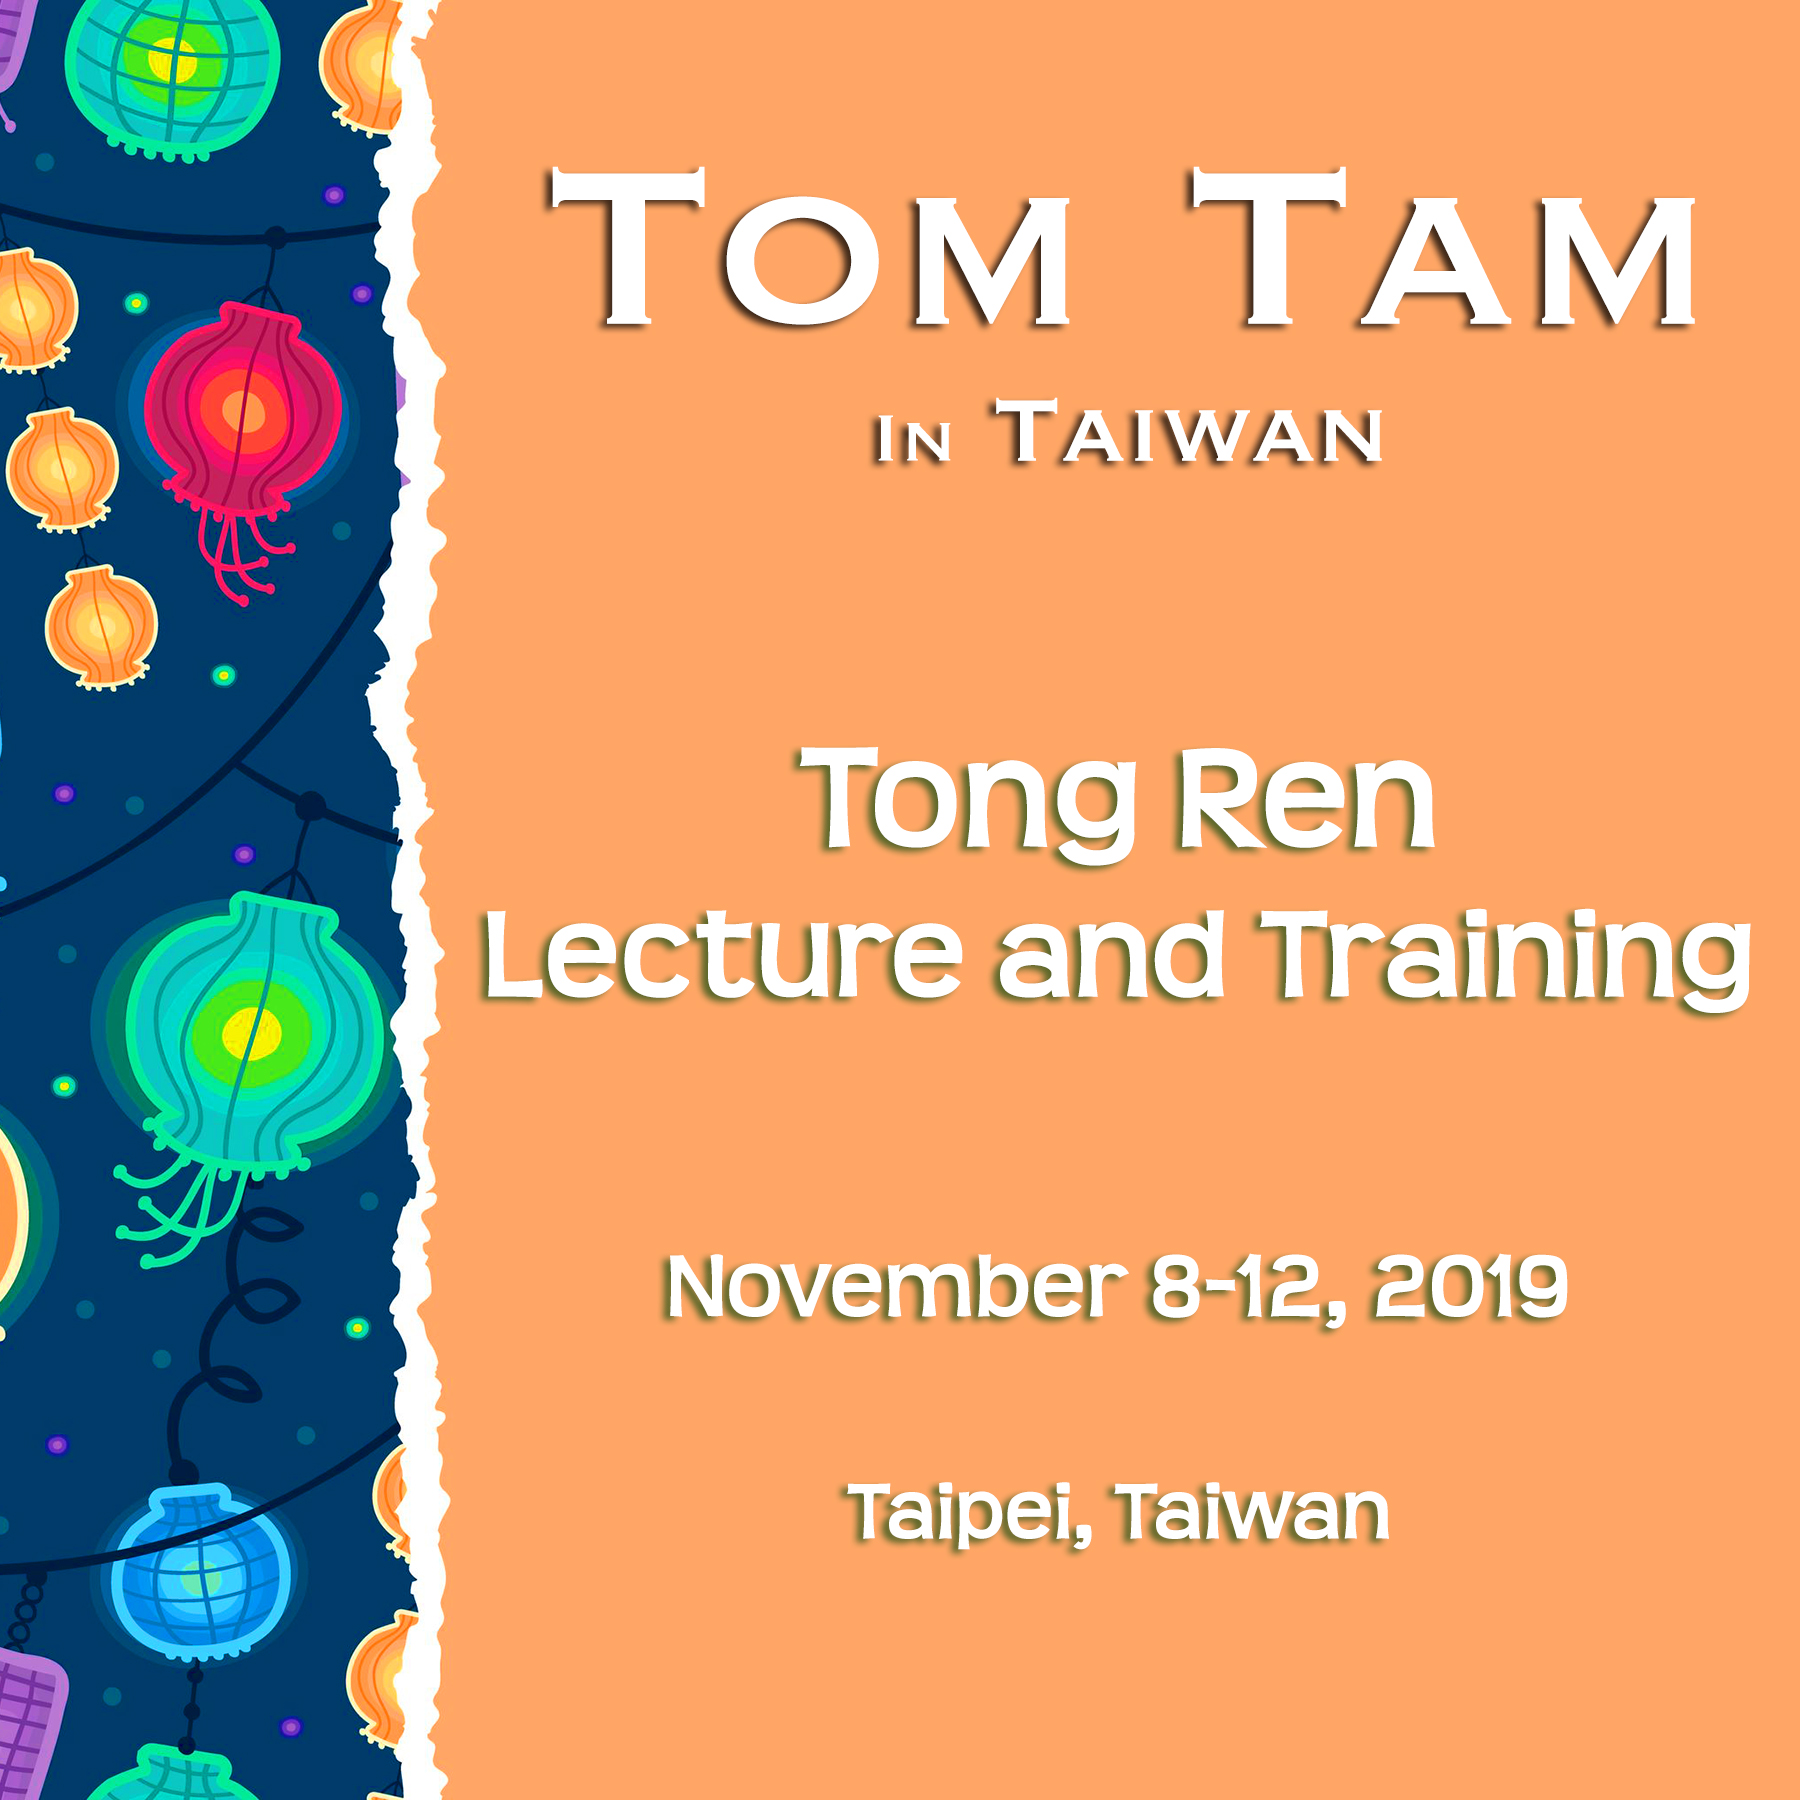 tom-tam-taiwan-2019